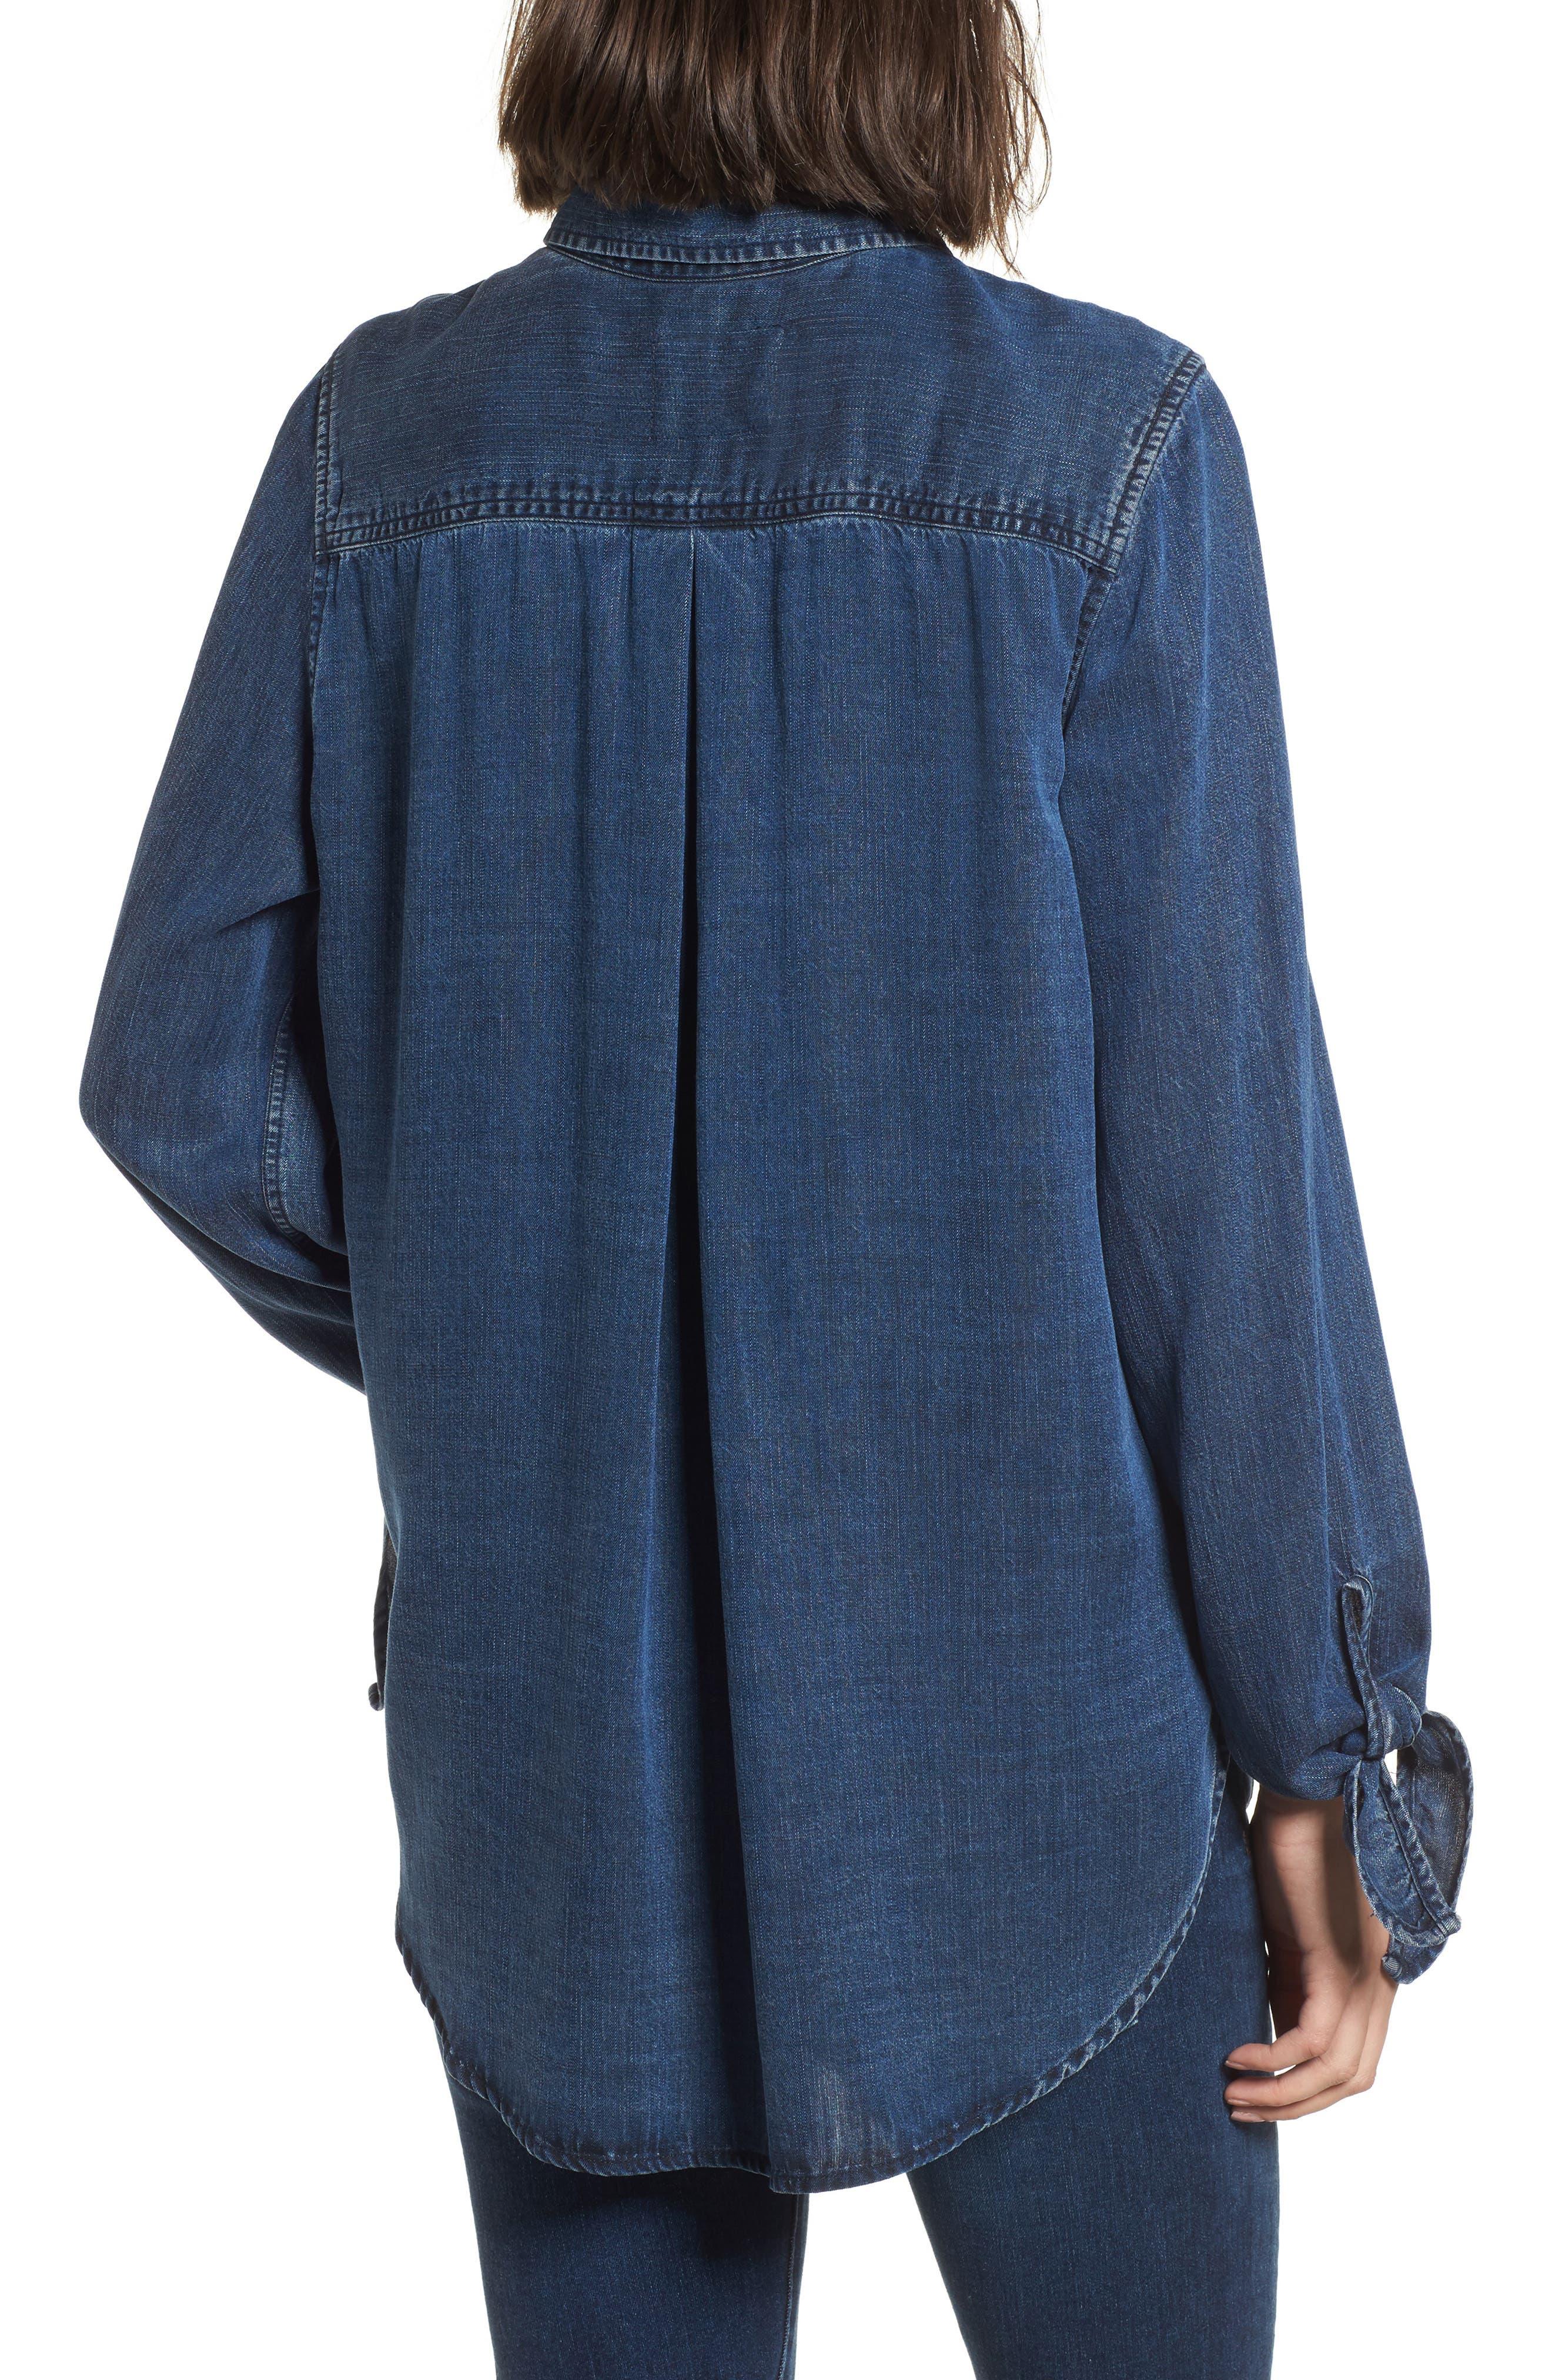 Bethany Tie Cuff Denim Shirt,                             Alternate thumbnail 2, color,                             Dark Vintage Wash